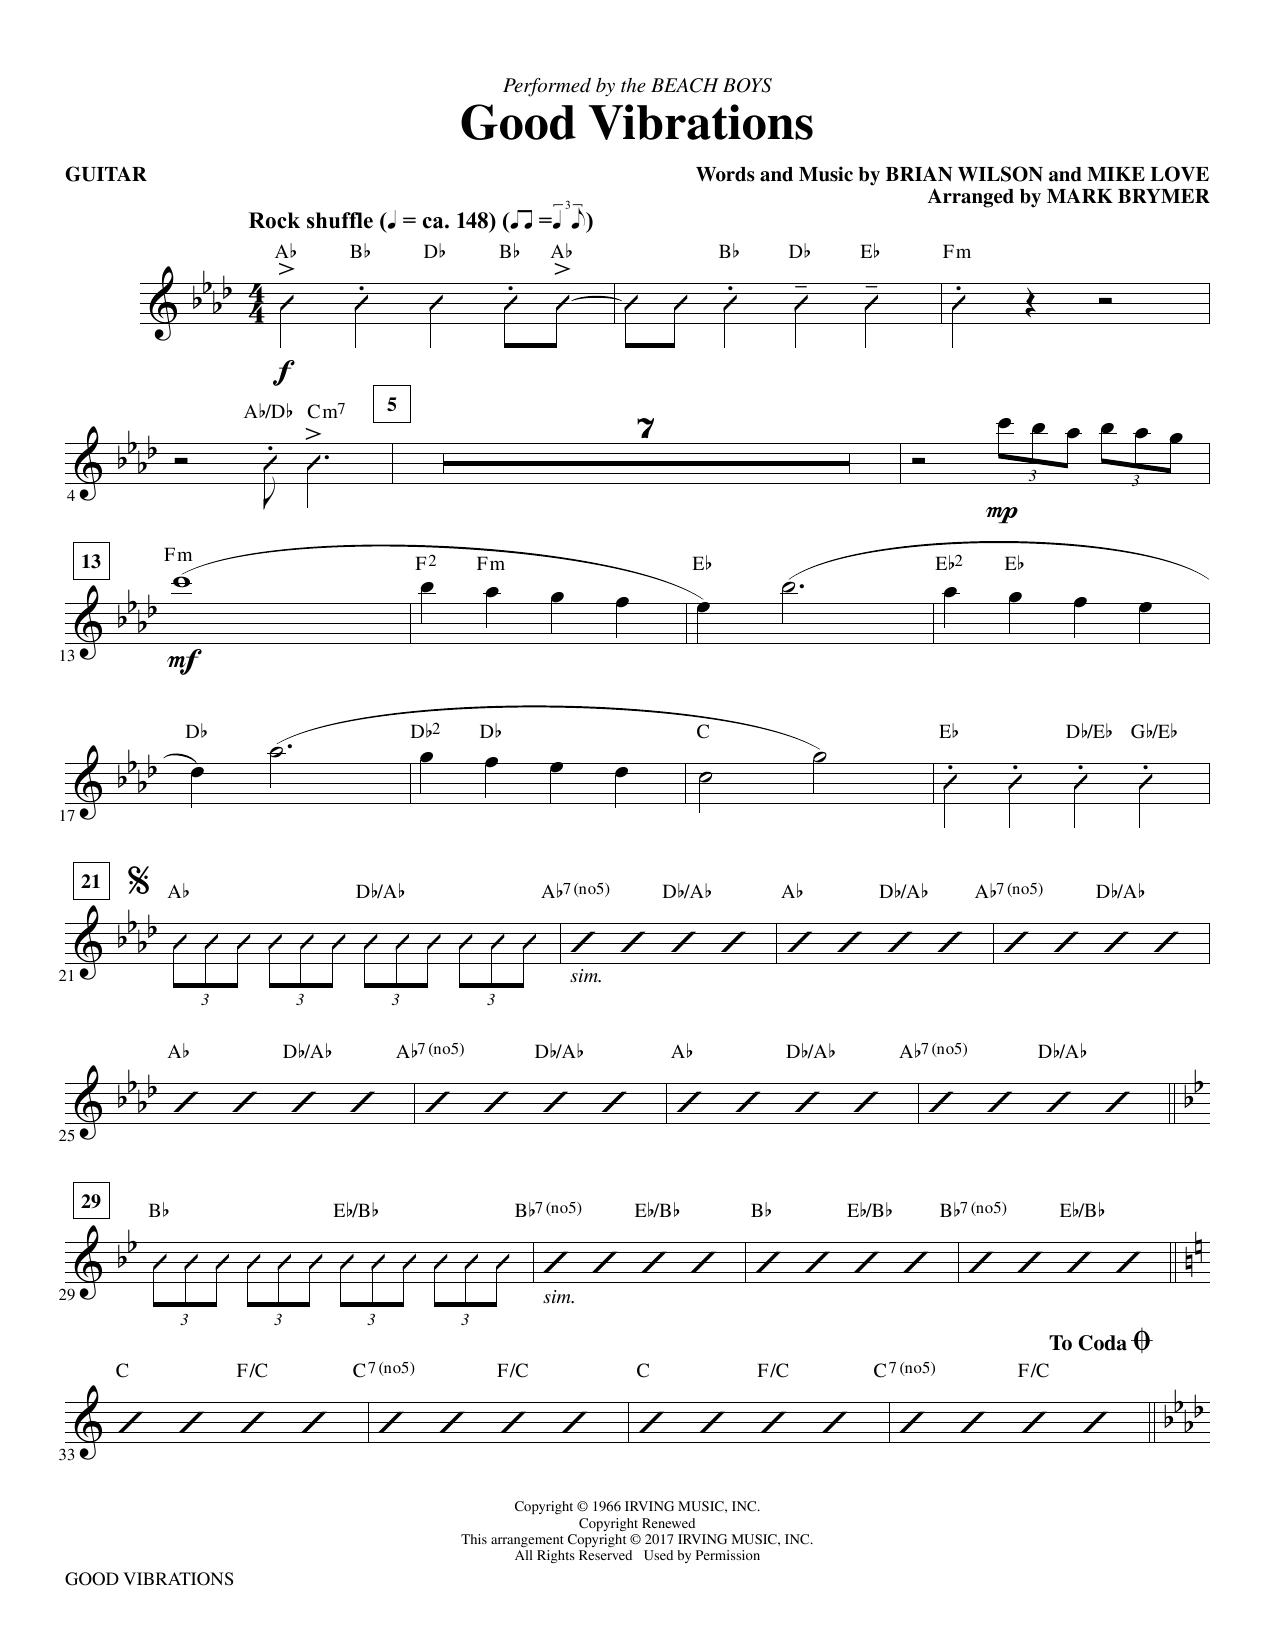 Good Vibrations - Guitar Sheet Music